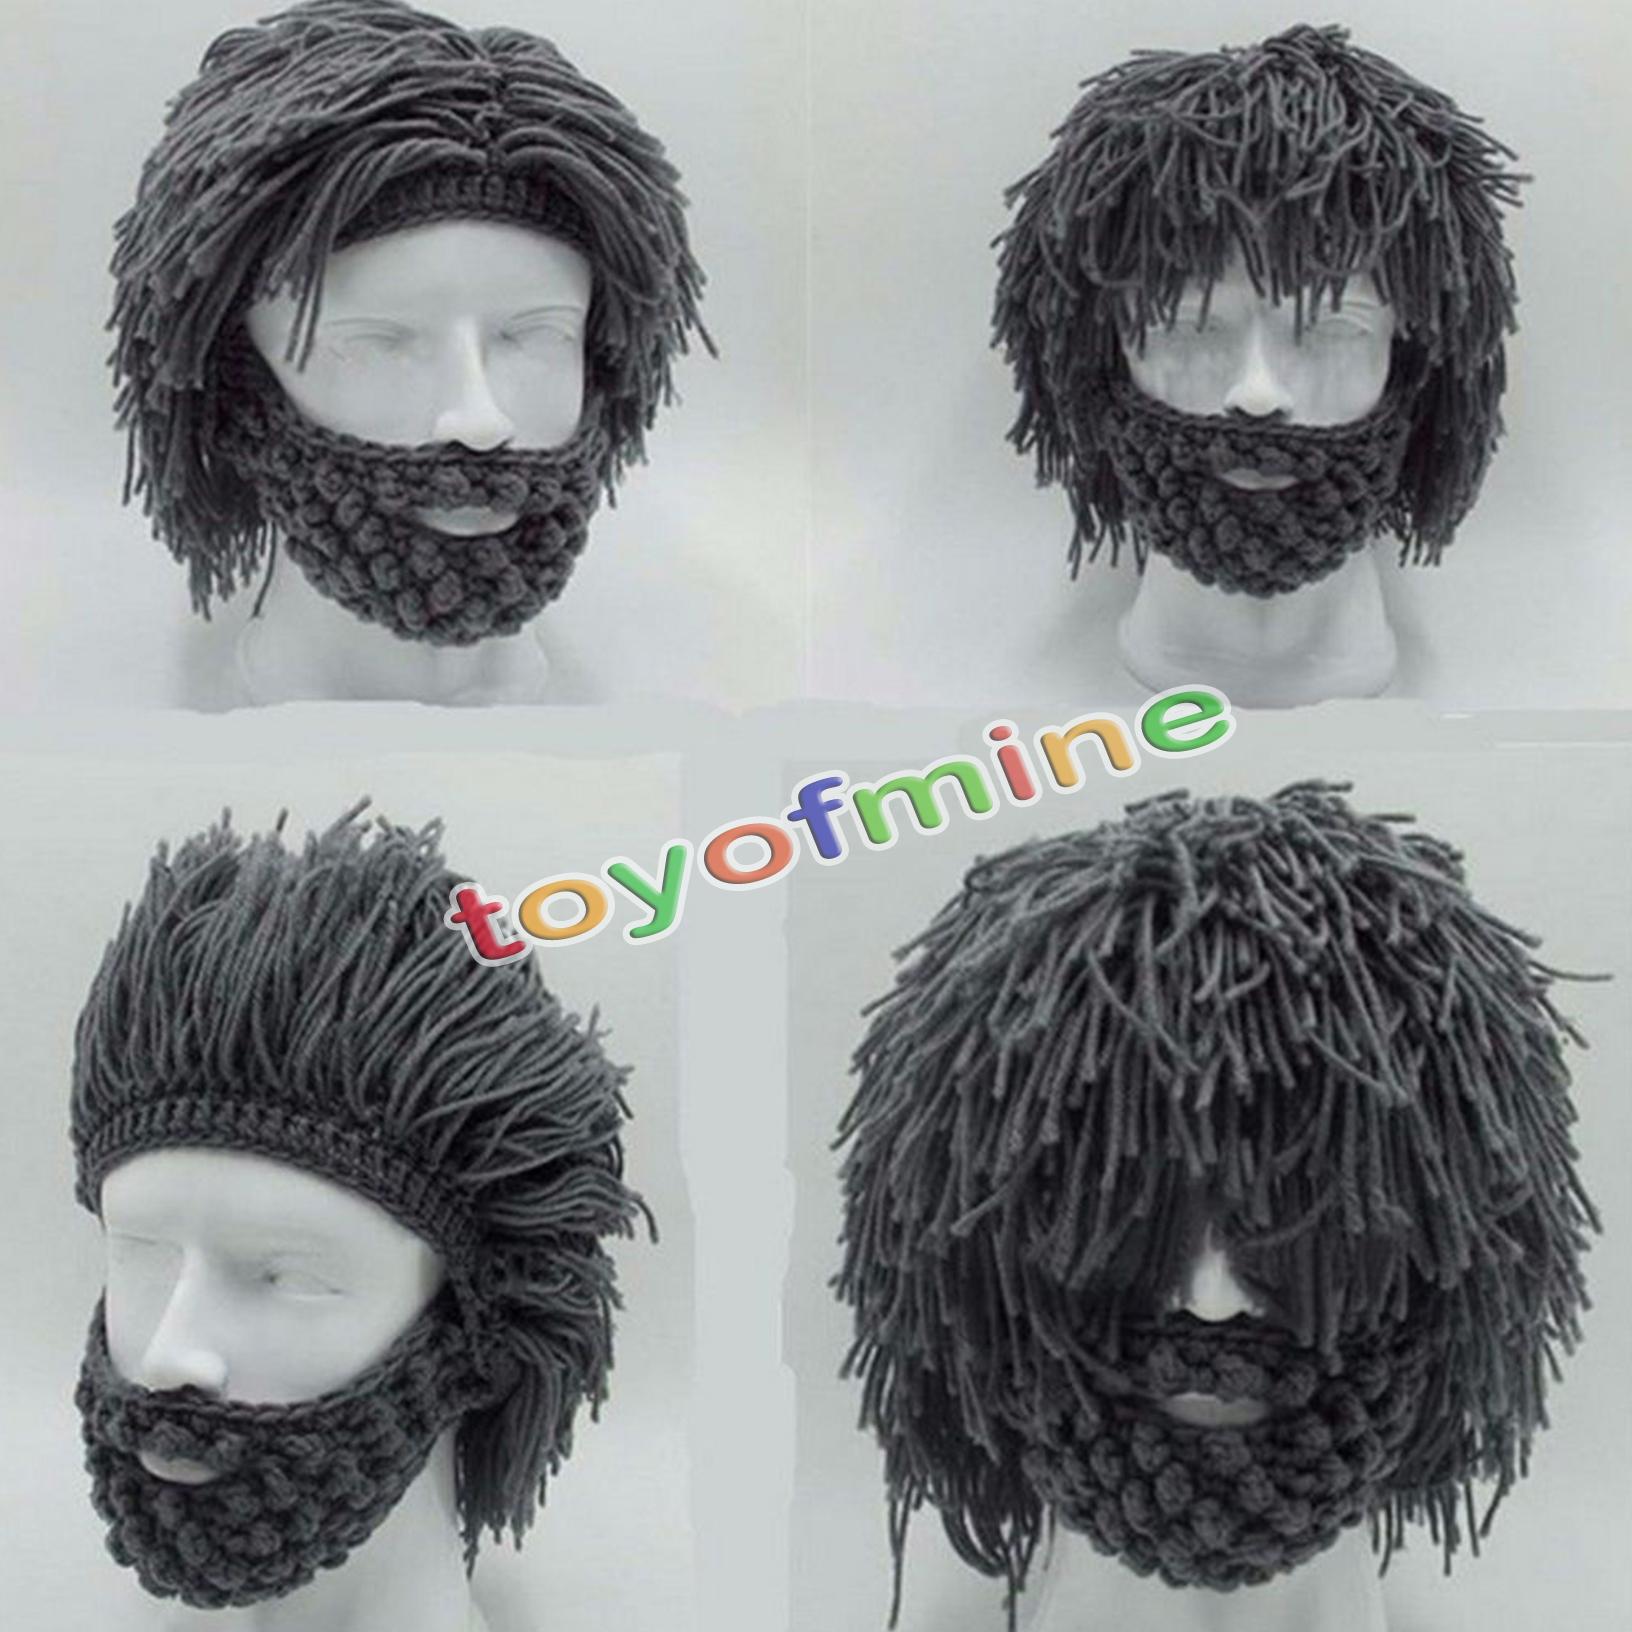 Knitting Pattern Beard Beanie : Grey Warm Beard Hat Barbarian Looter Crochet Beanie Cap ...